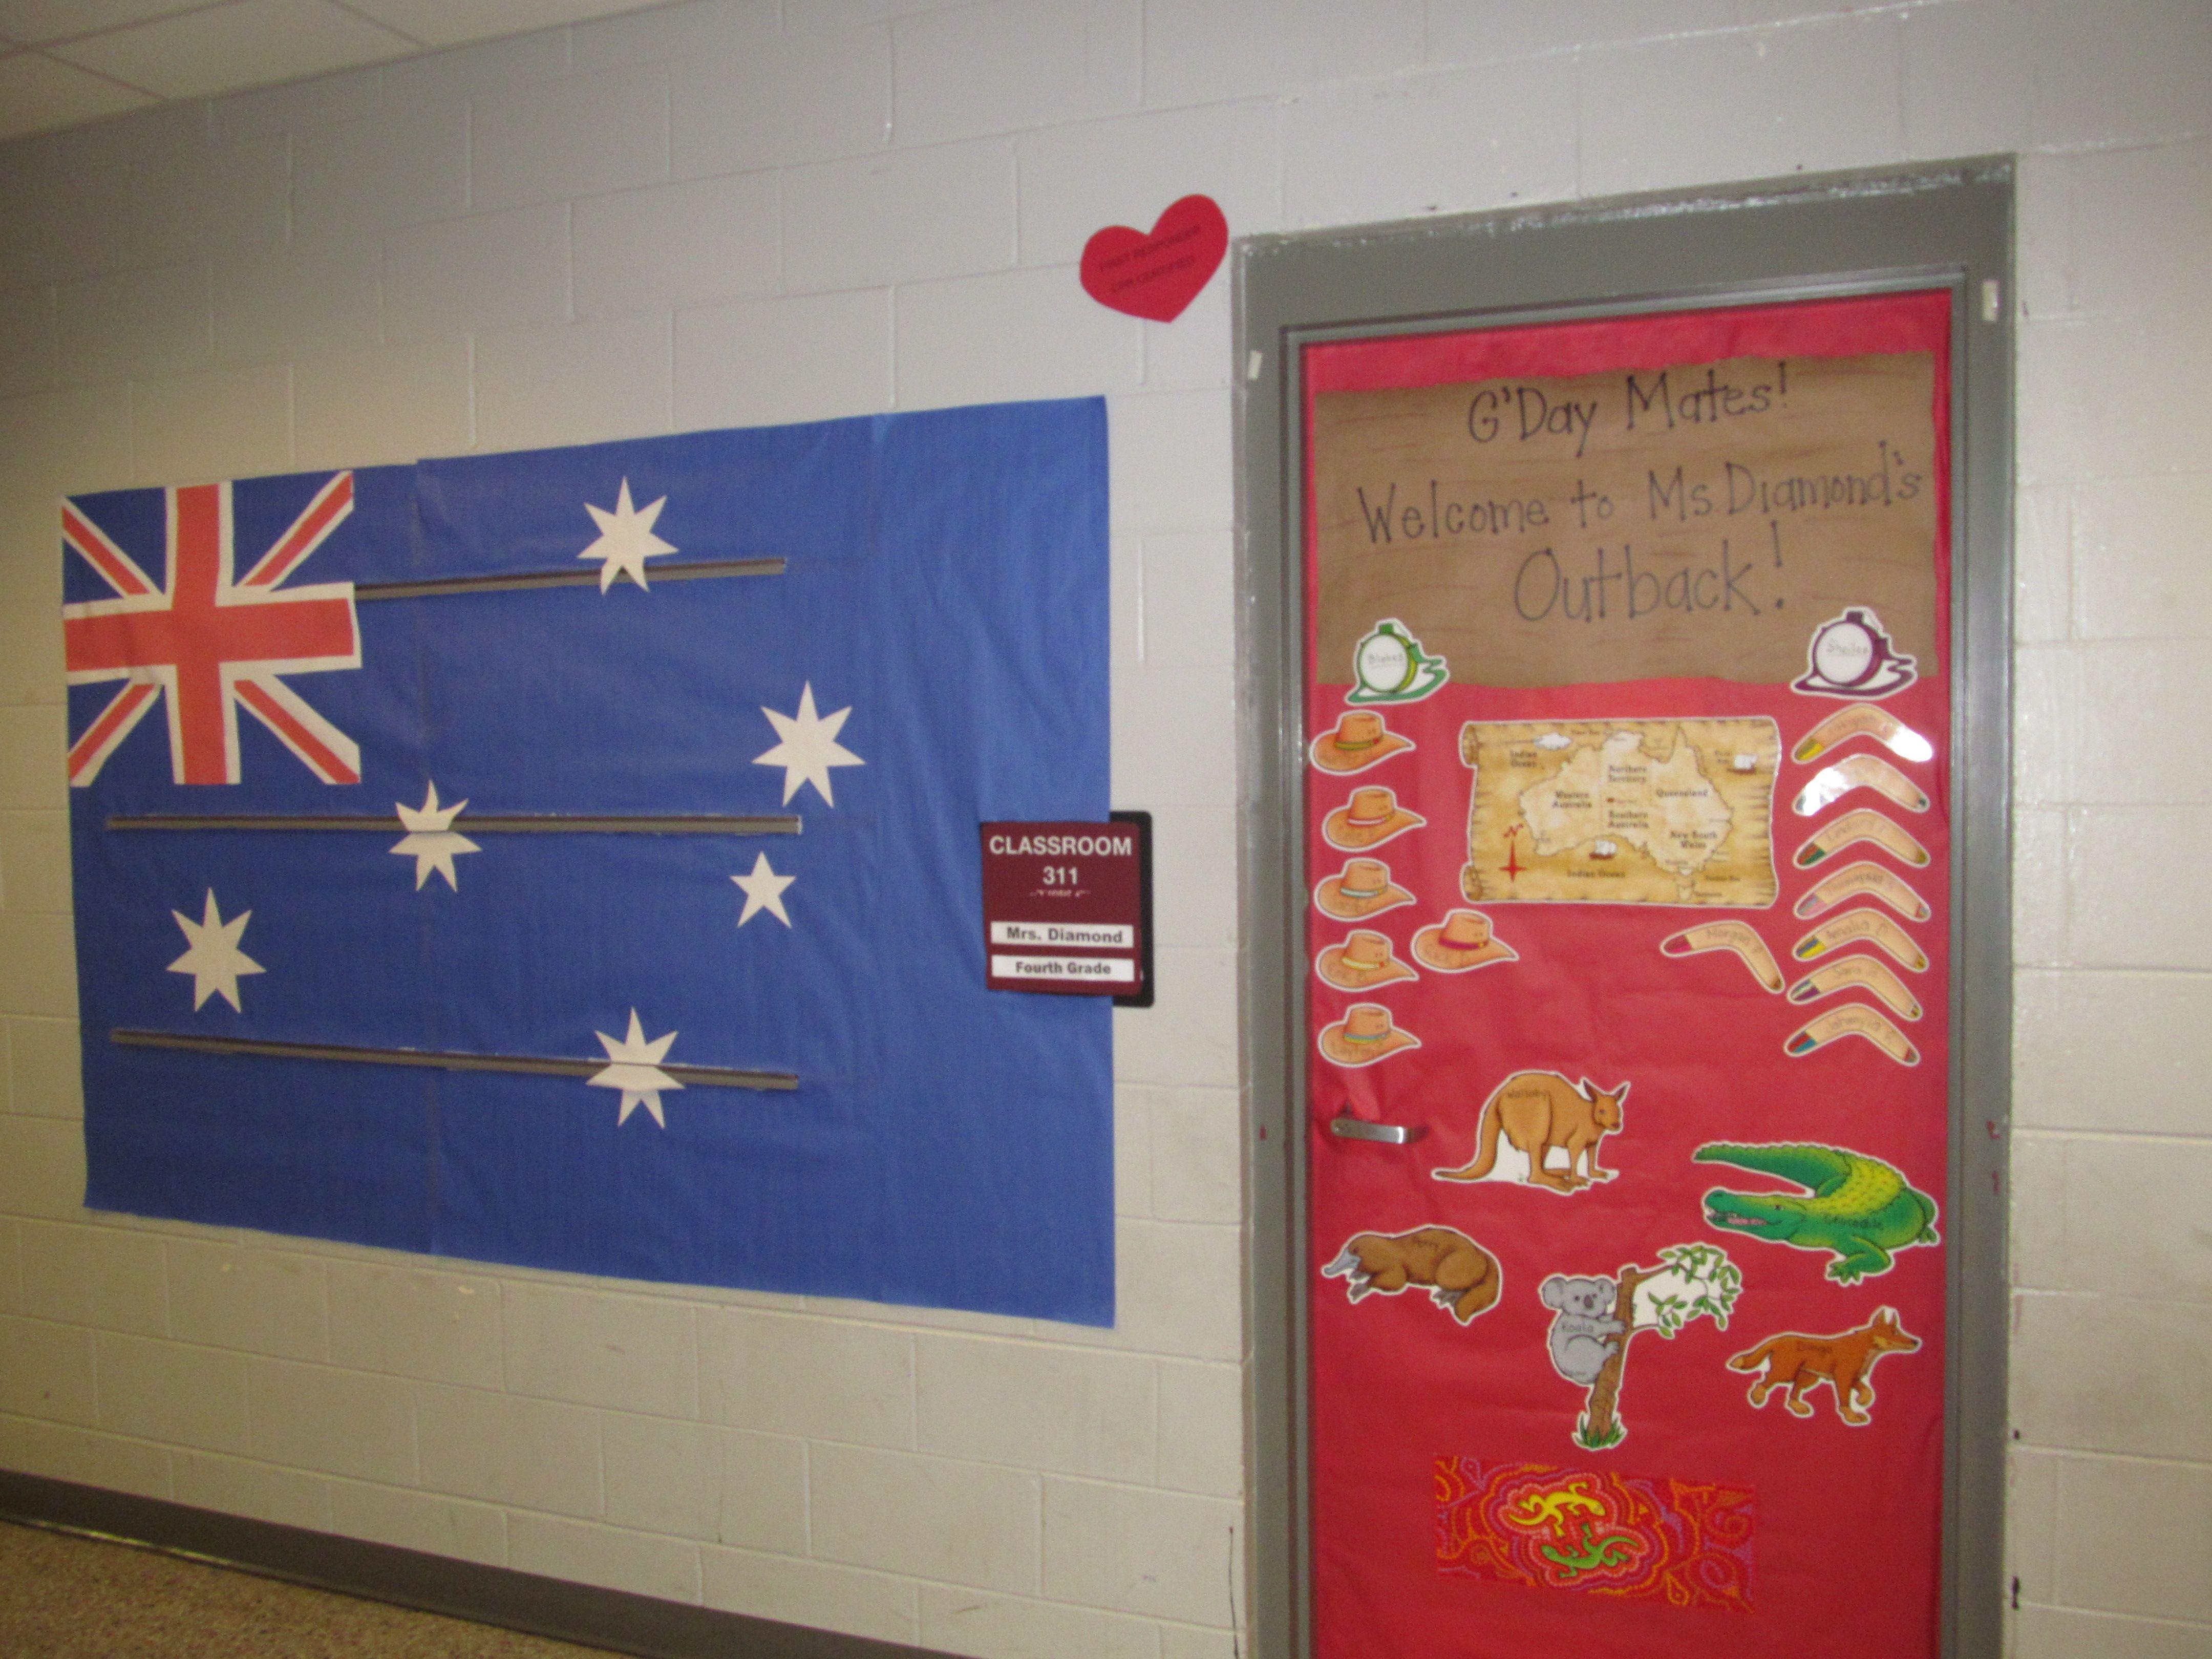 Classroom Decorations Australia ~ Ms diamond s classroom outback australia lpe school